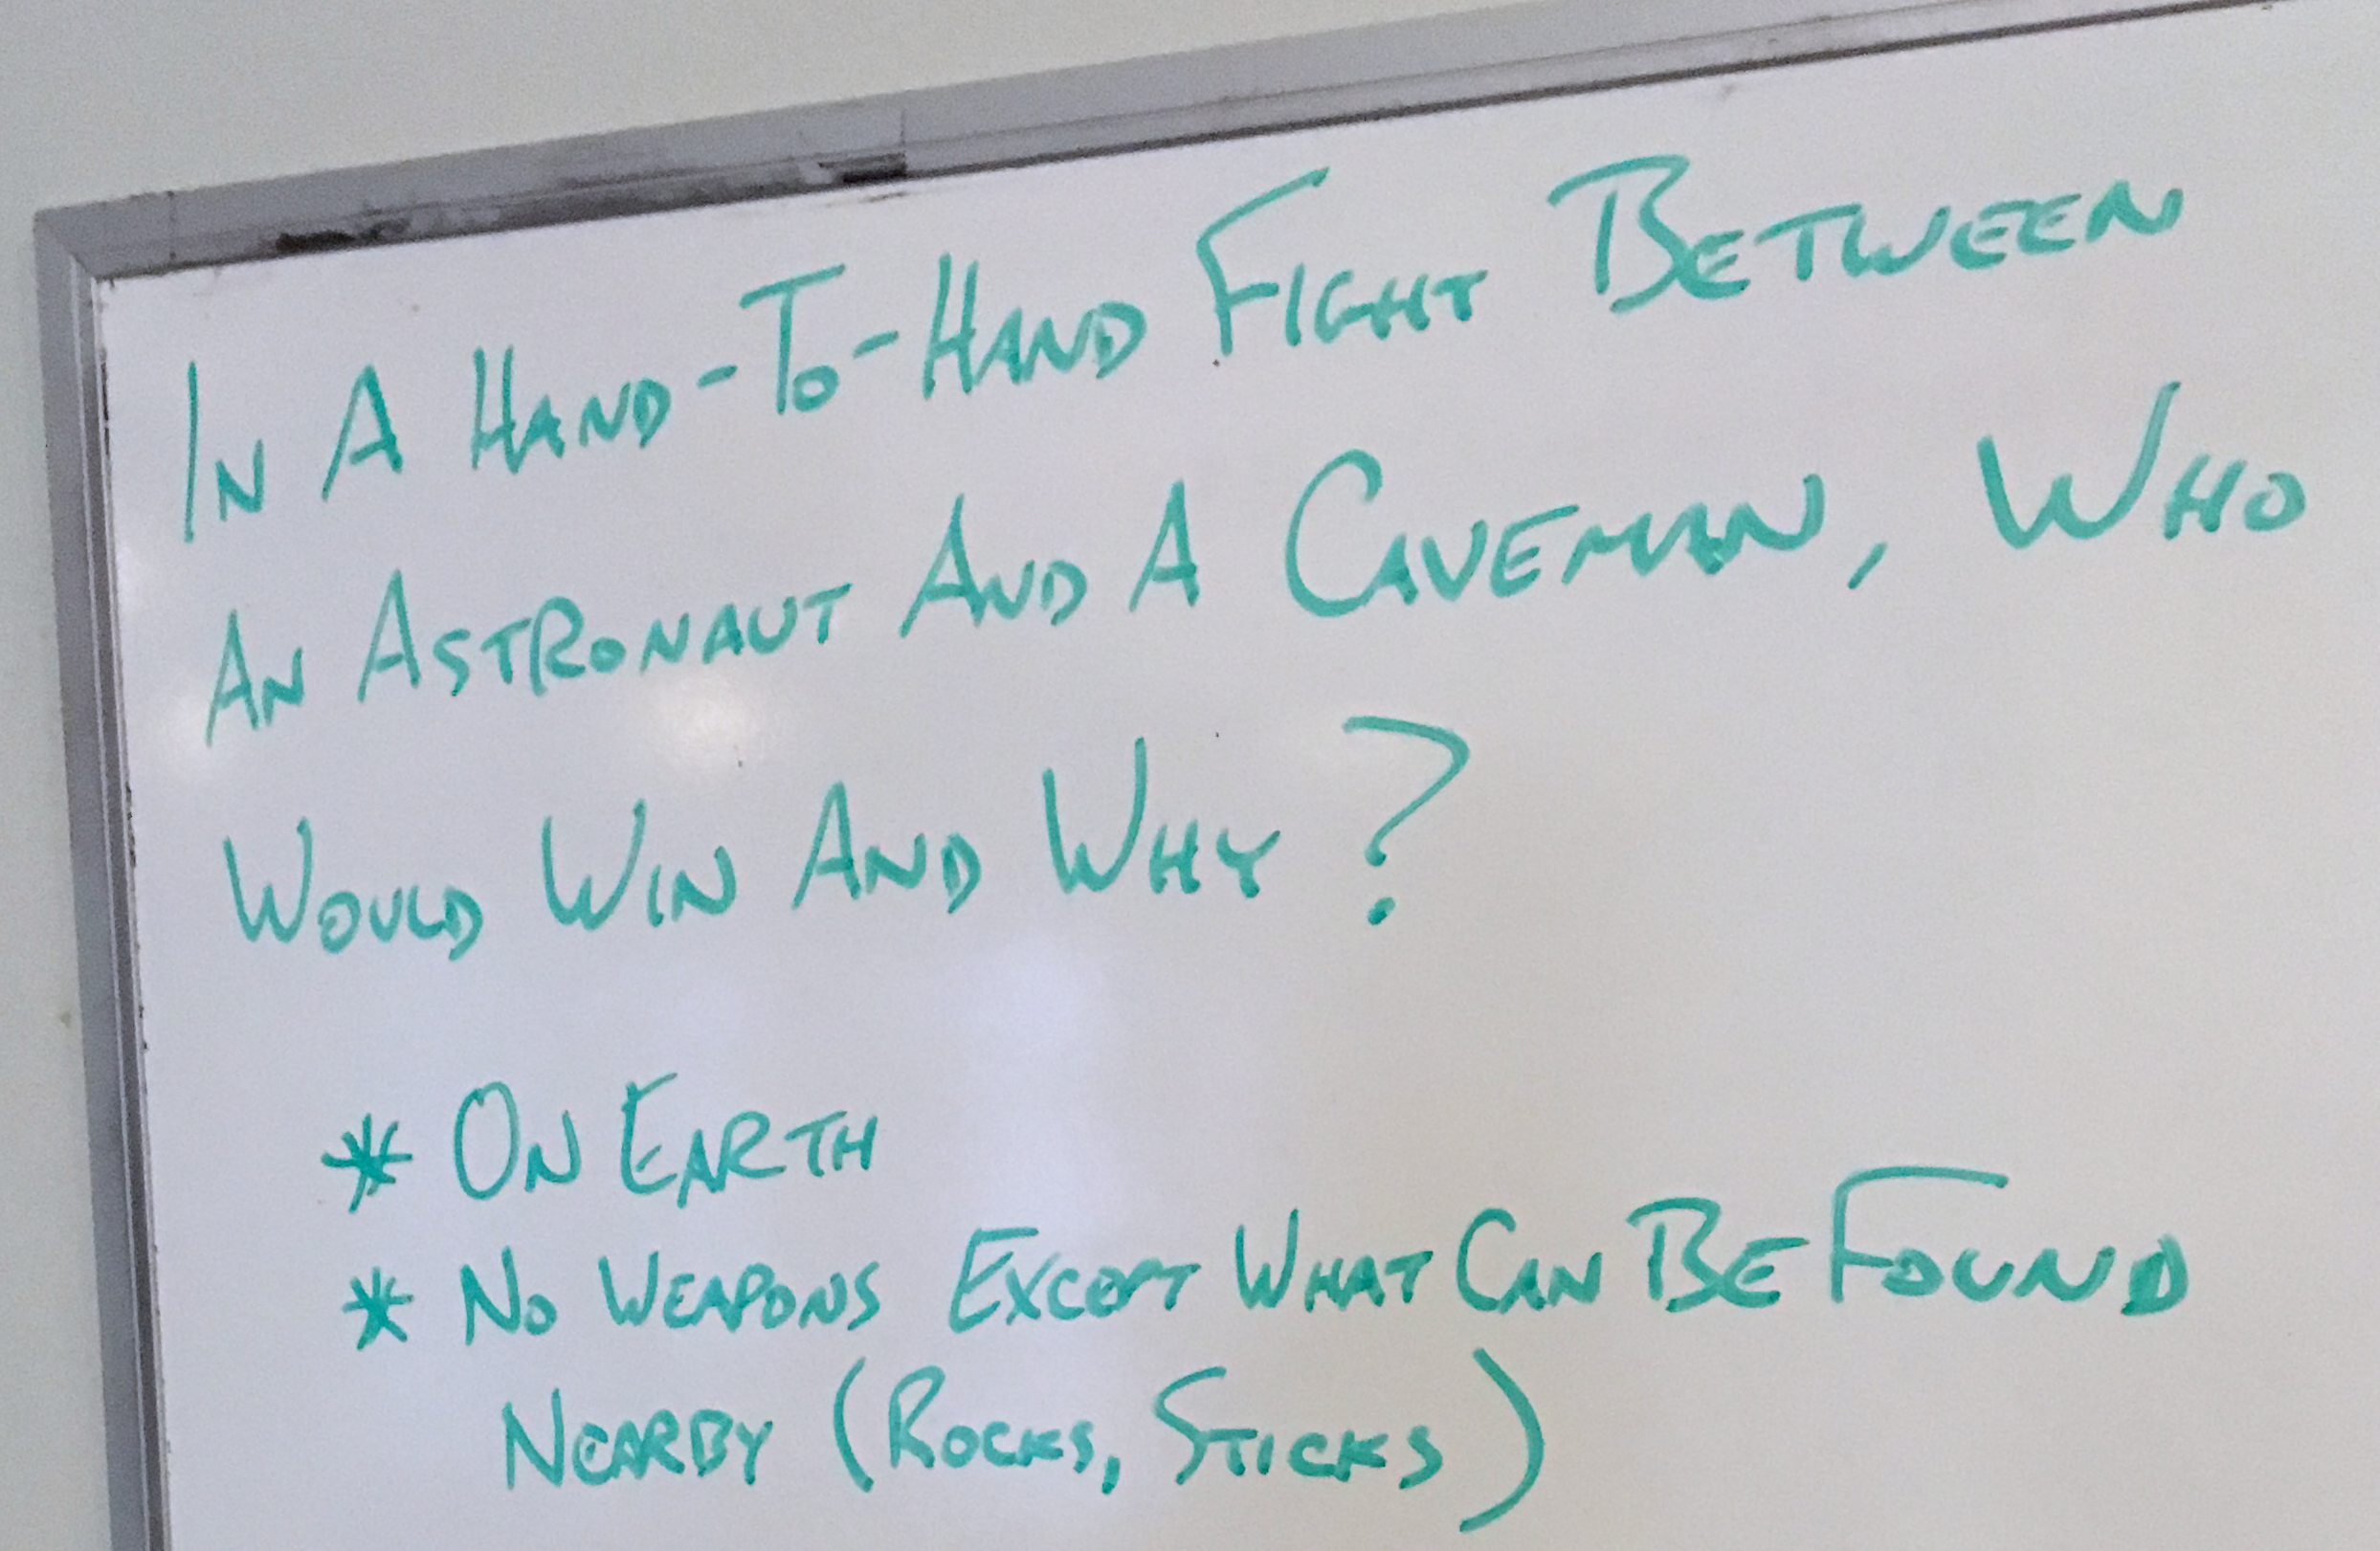 Caveman Questions : Unconscious sexism in the workplace u2013 netninja.com